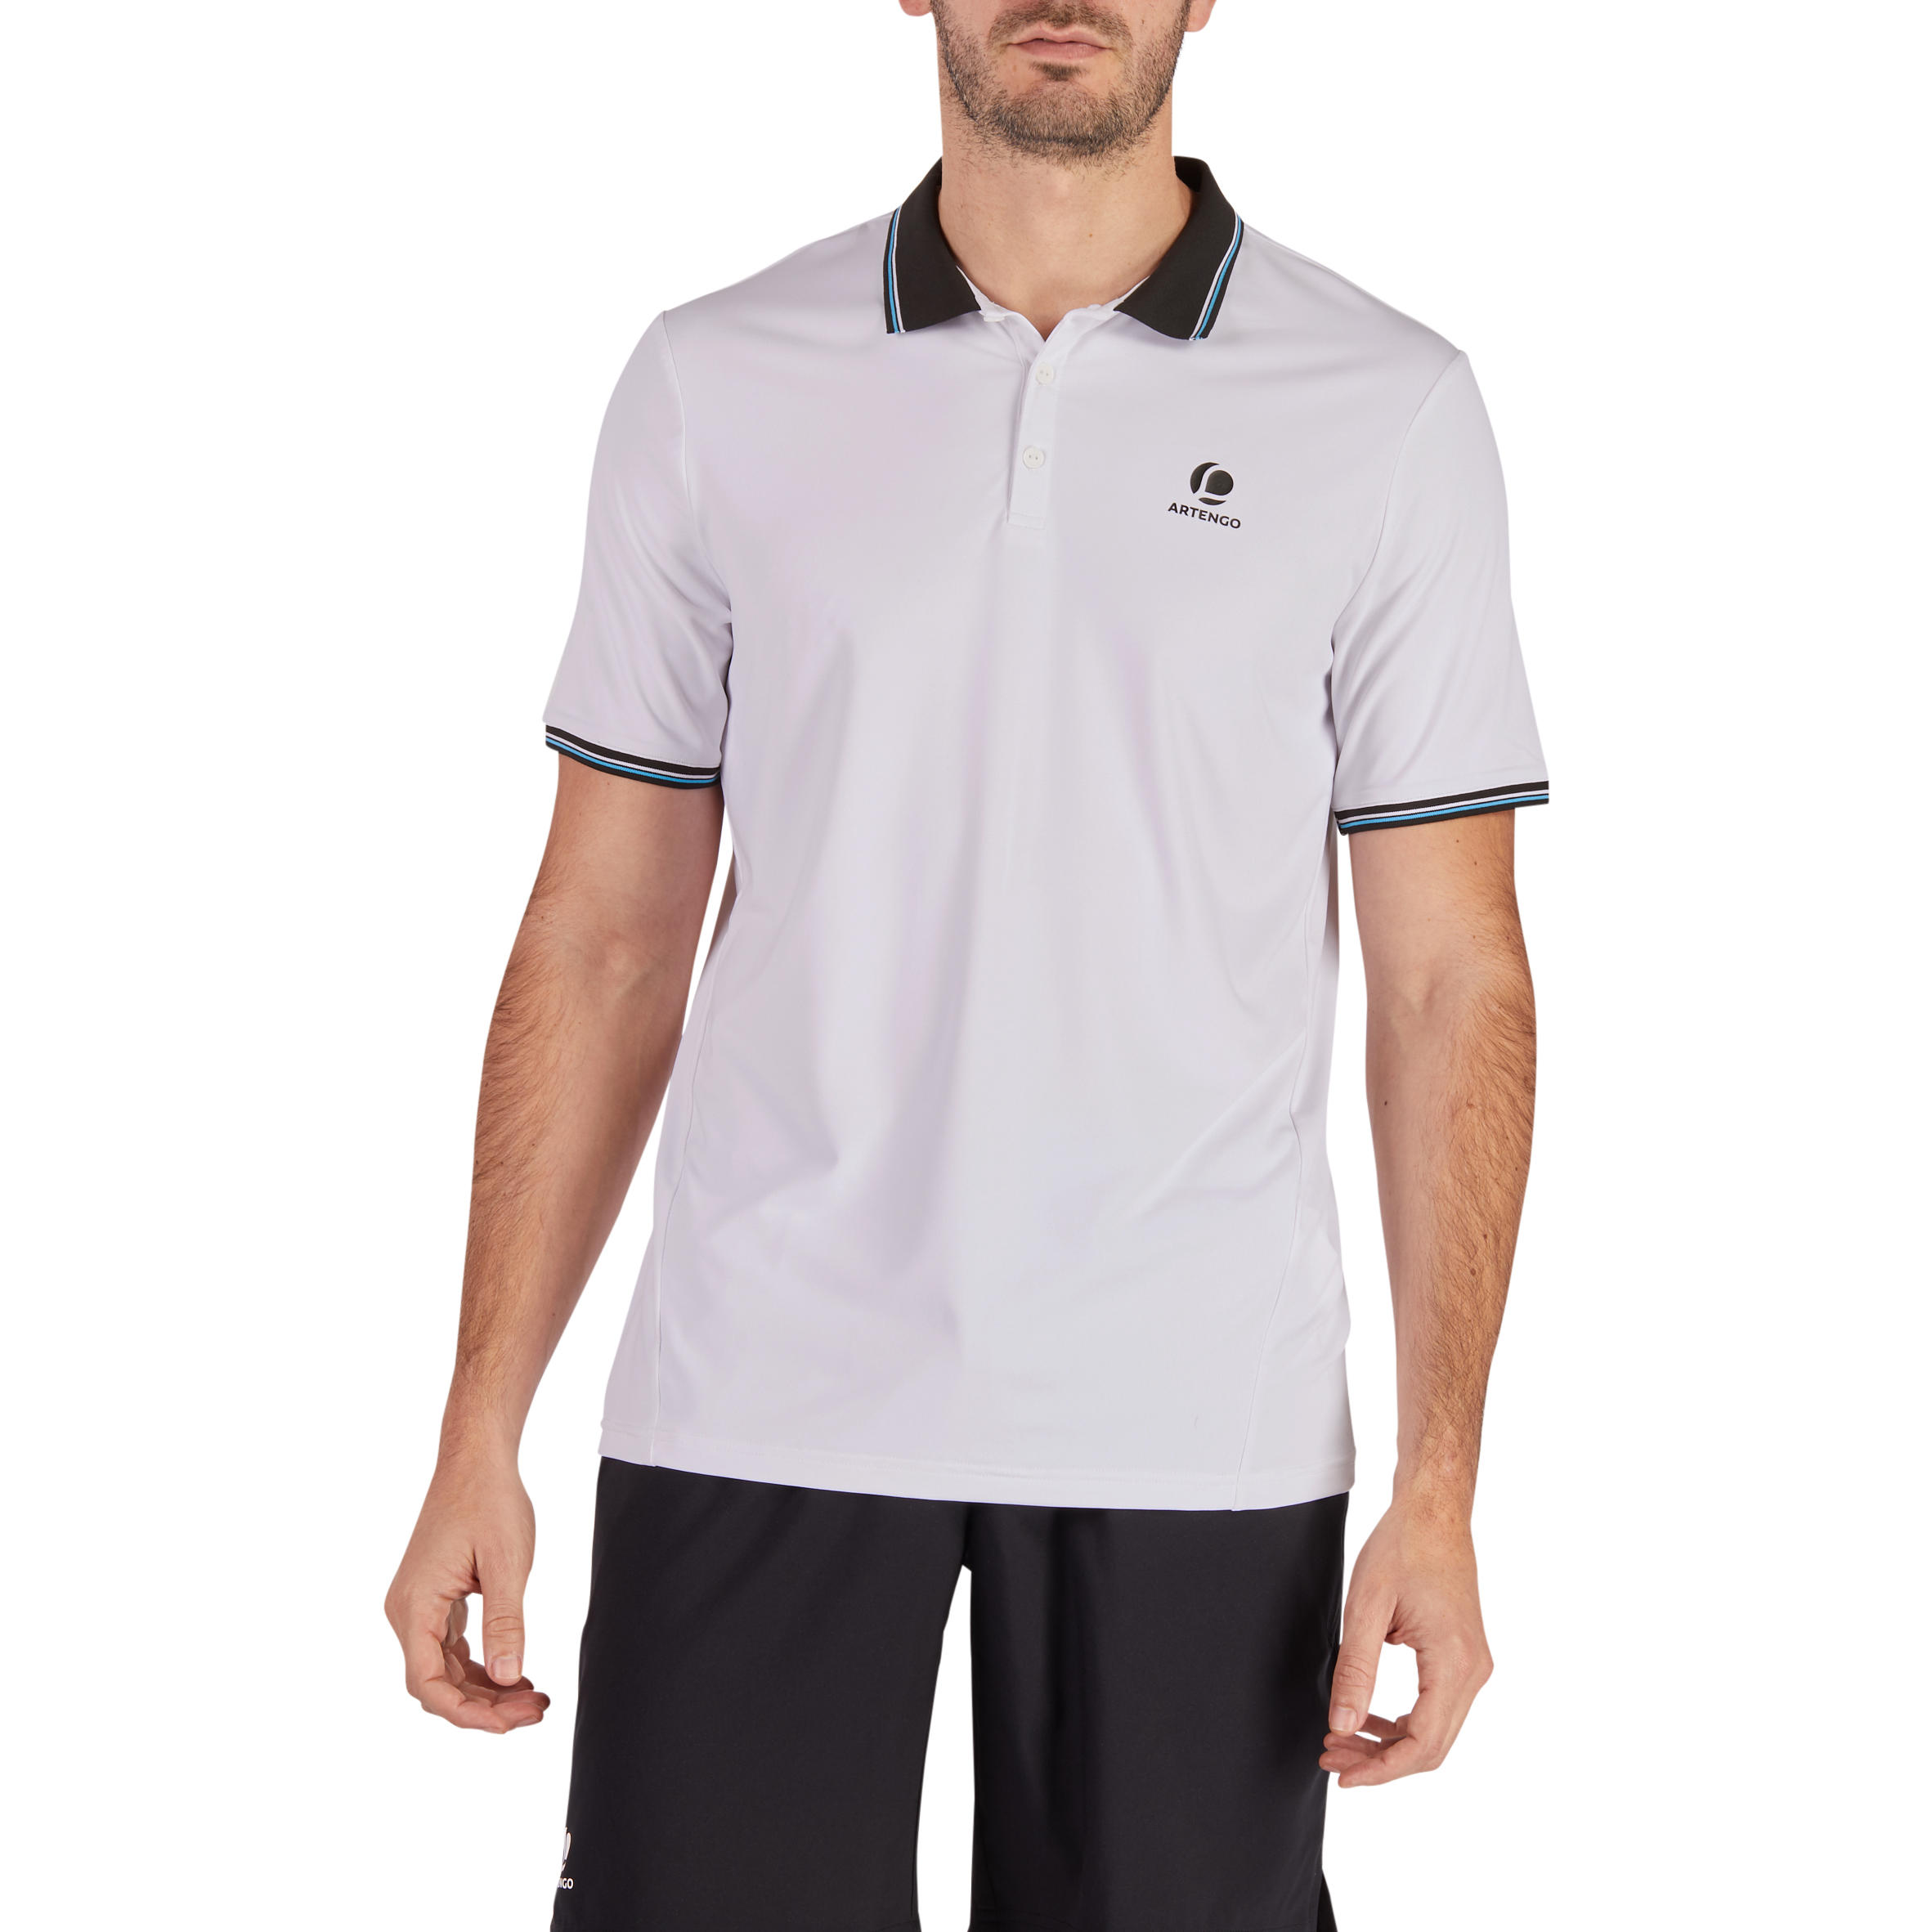 Dry 500 Tennis Polo Shirt - White